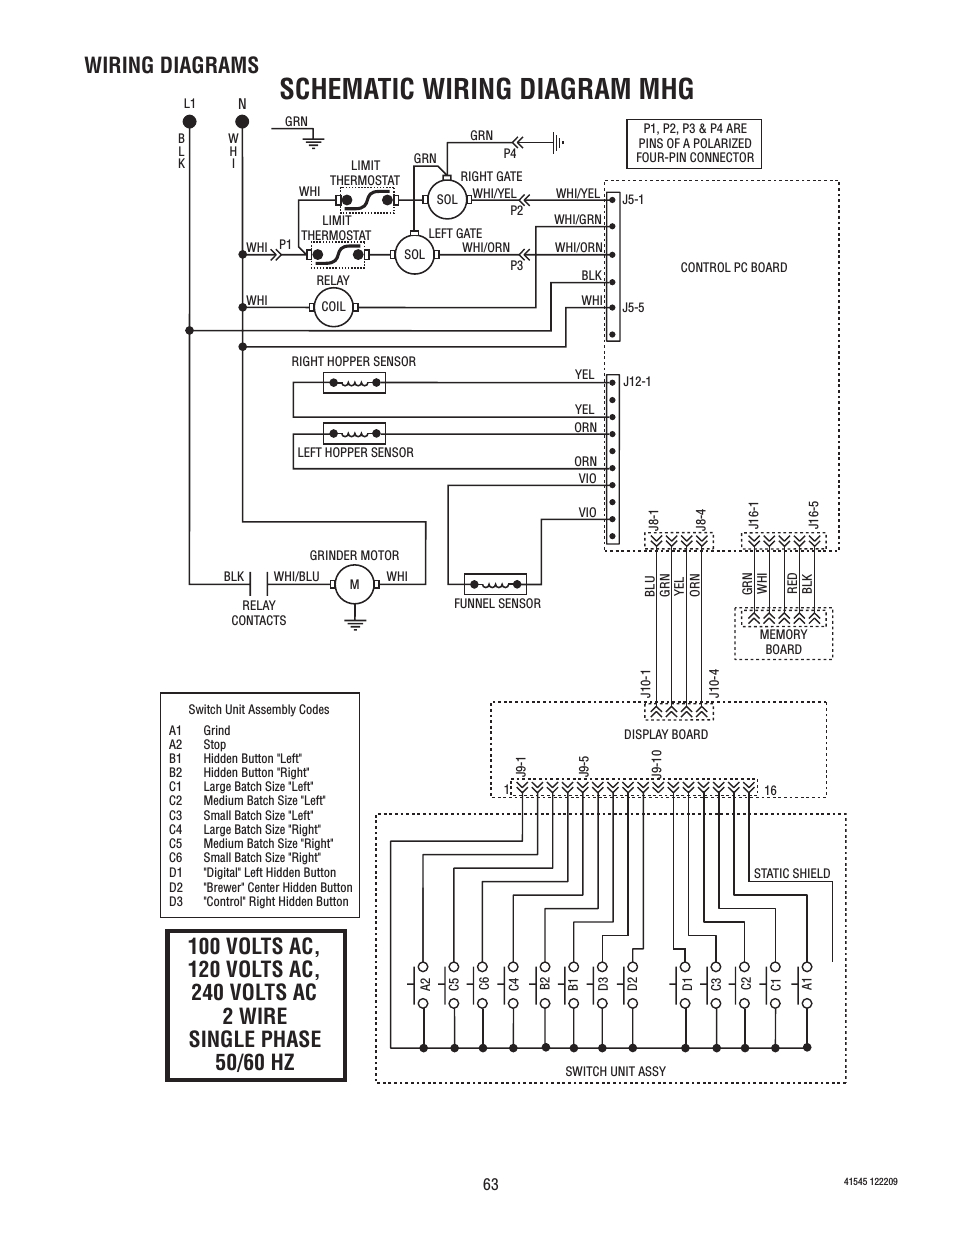 bunn wiring diagram wiring diagram data